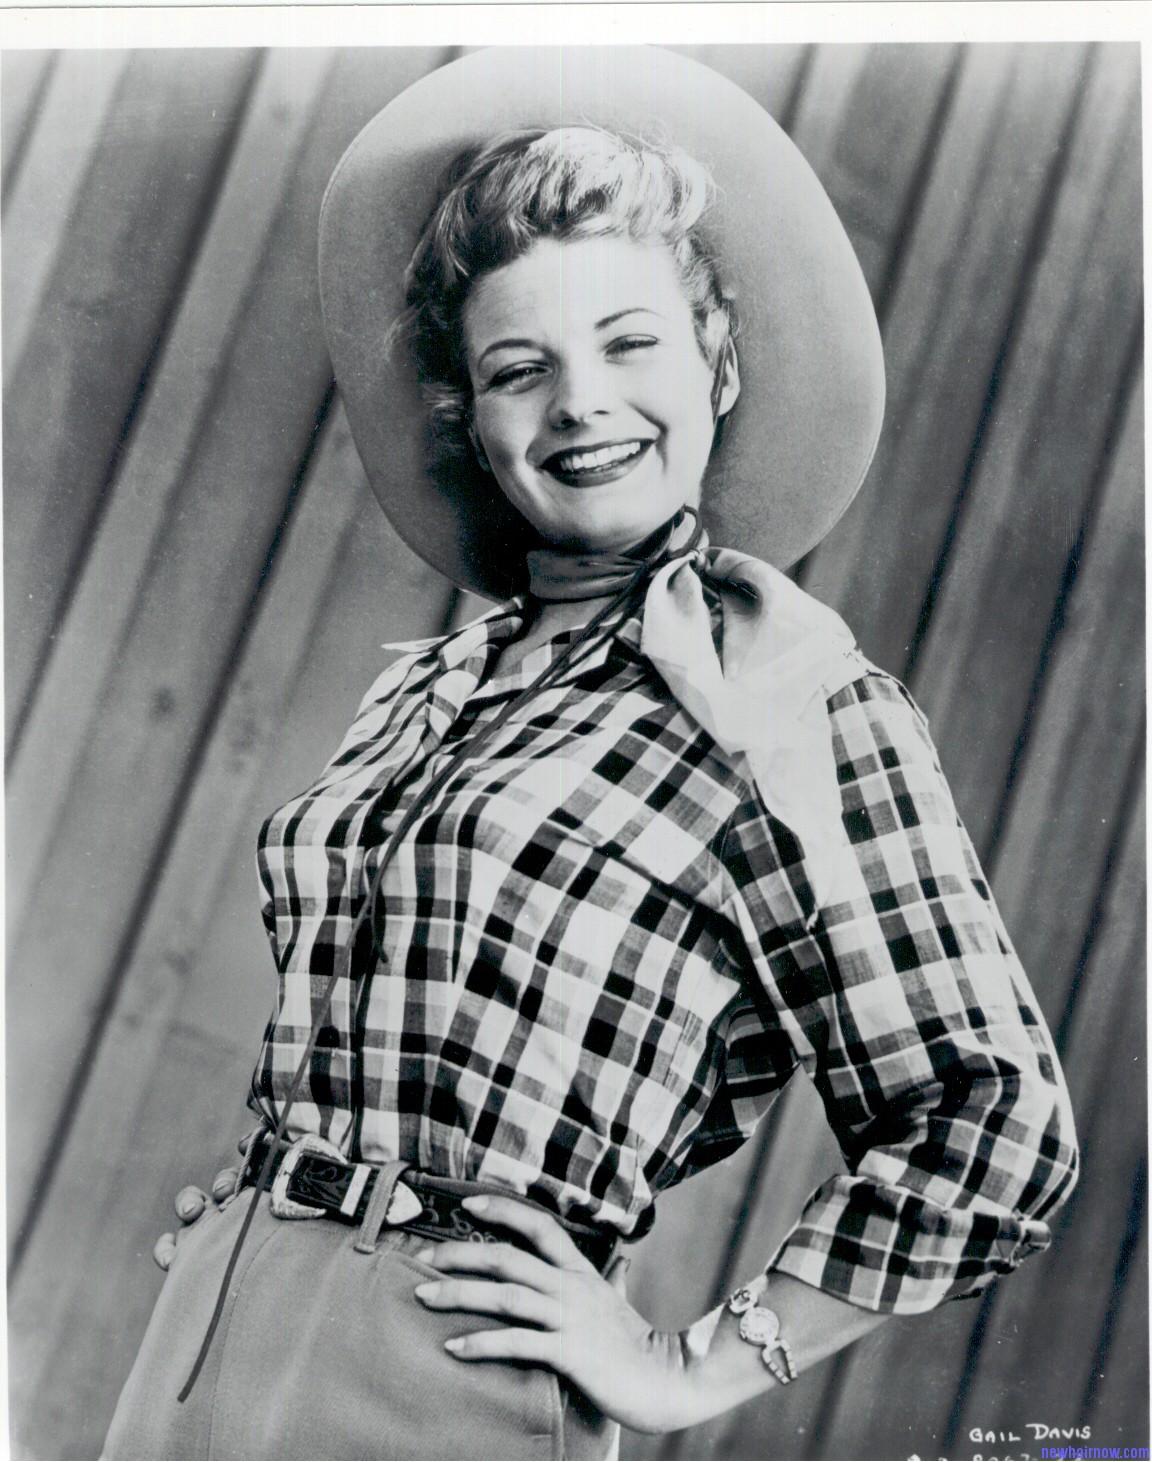 1950s Gail Davis glossy print